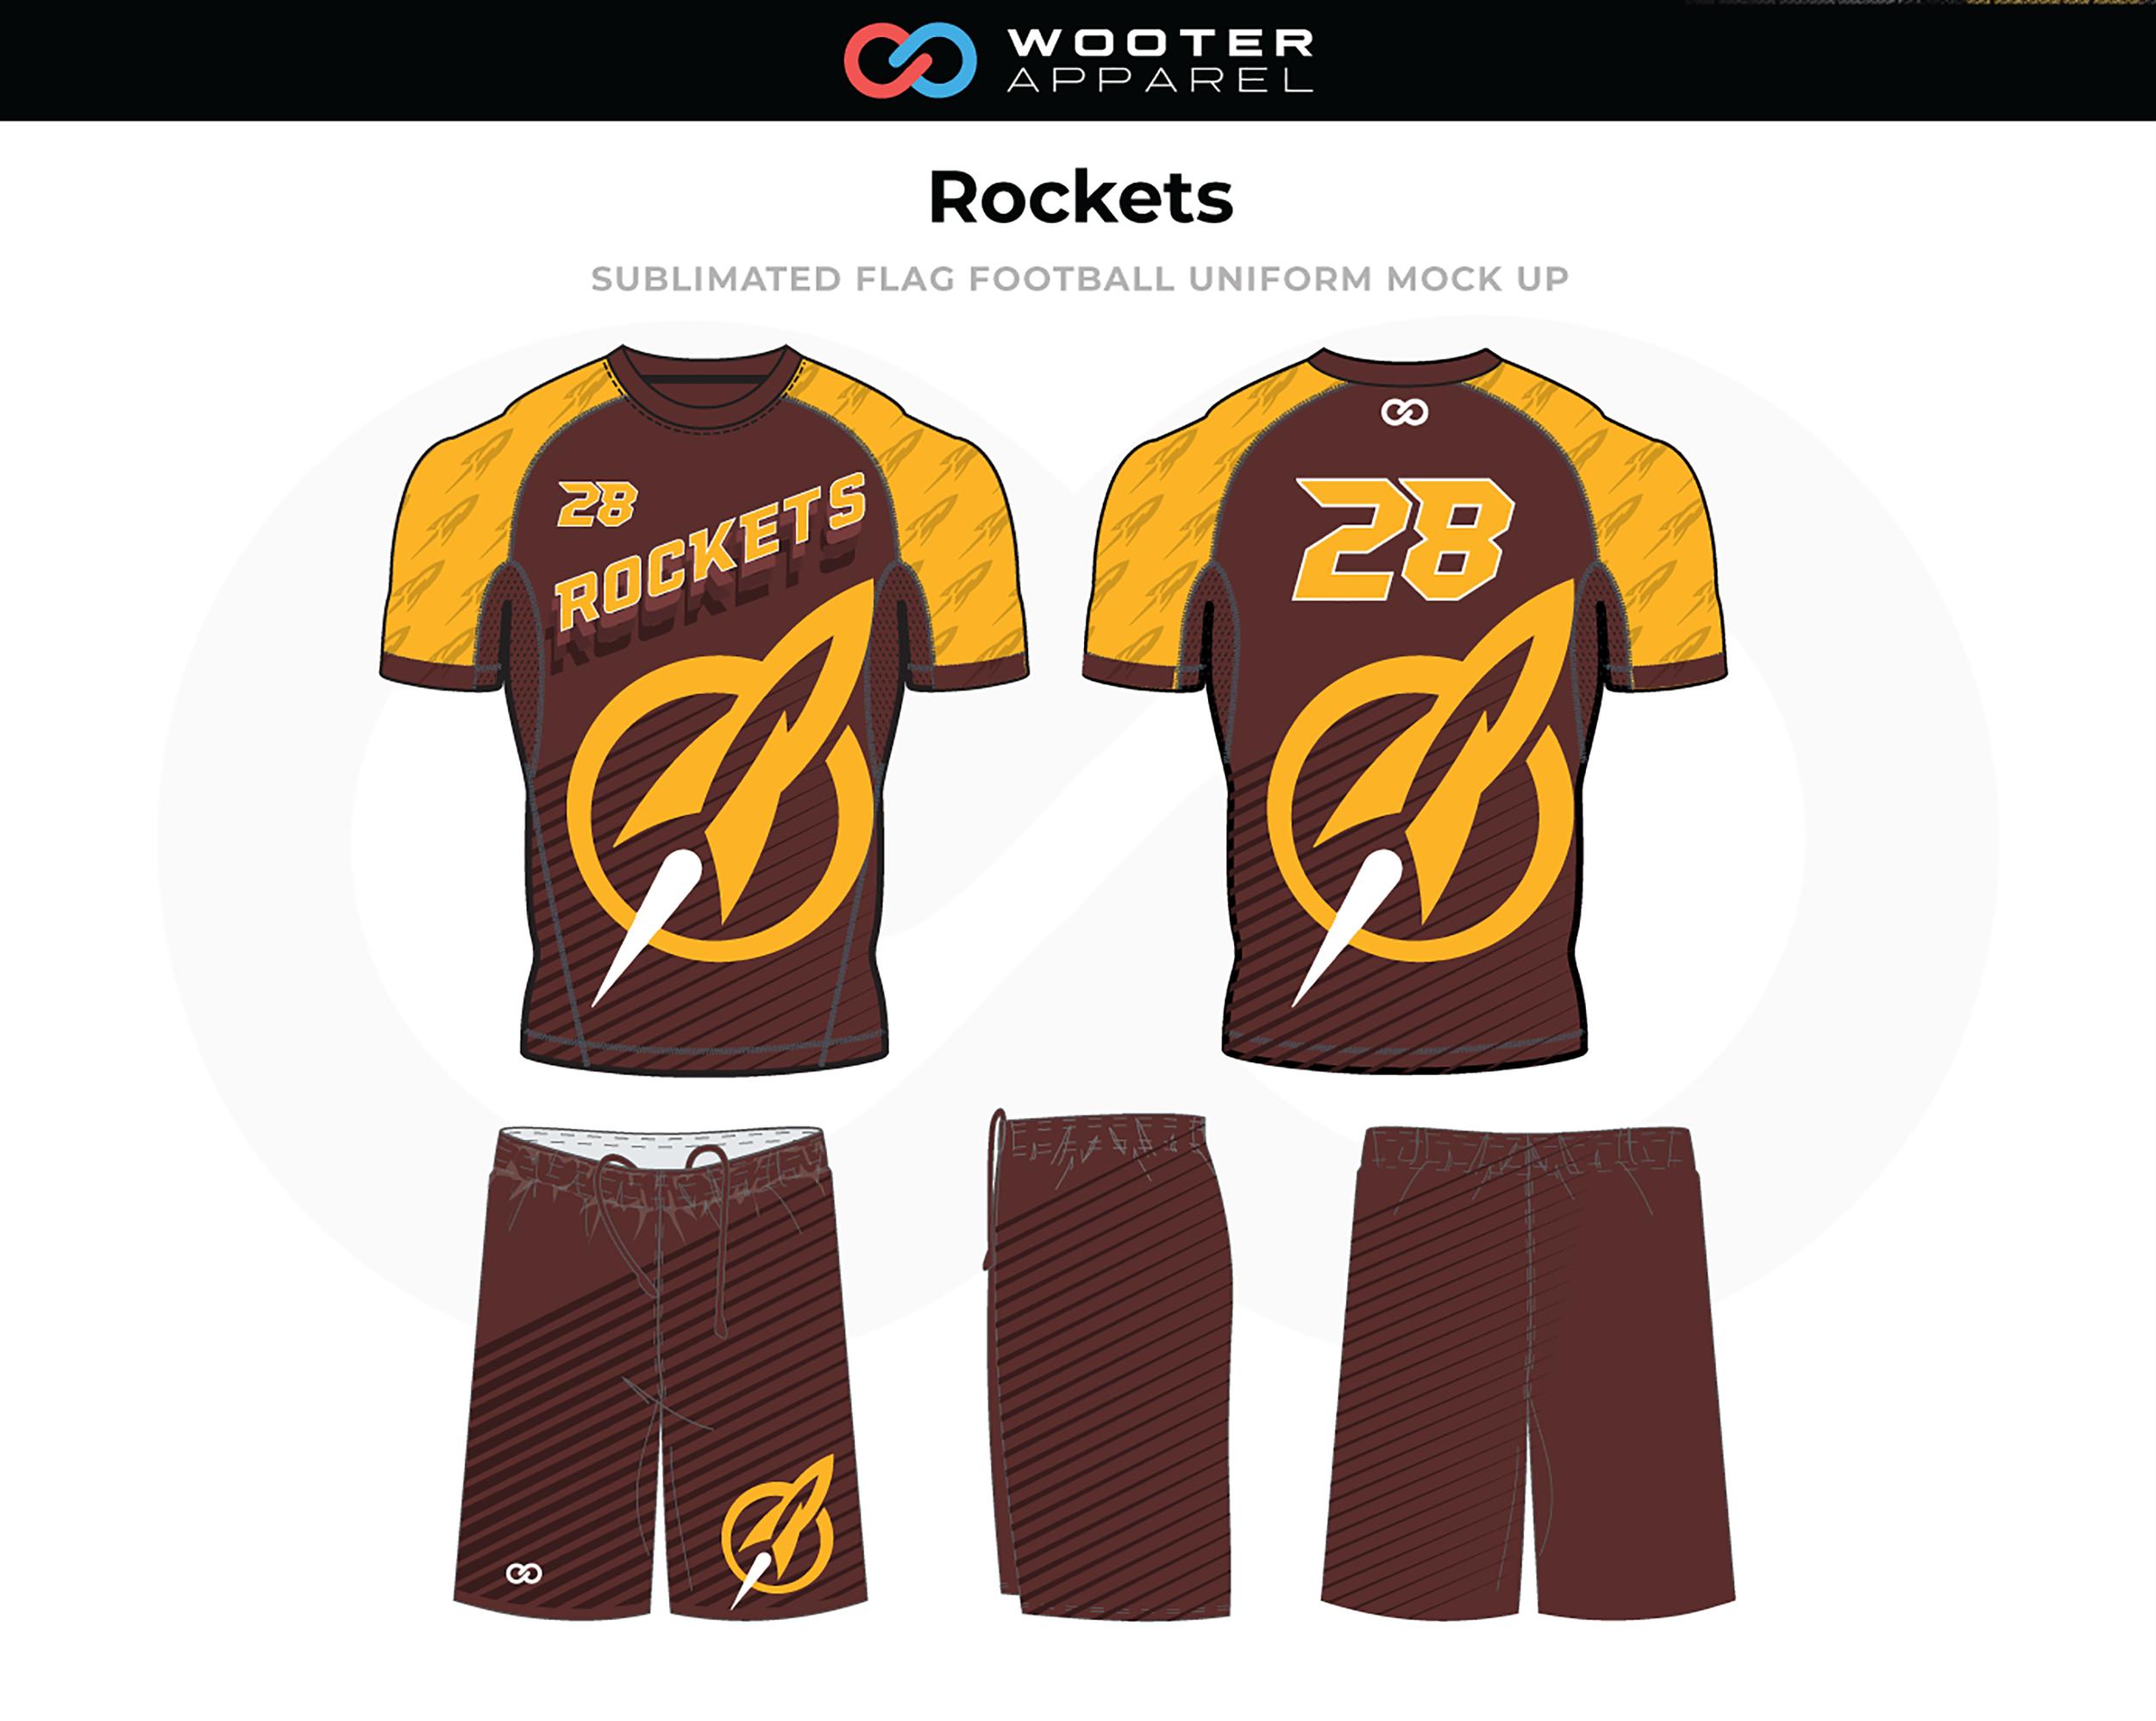 Rockets-Flag-Football-Uniform-Mock-Up_-V1.png